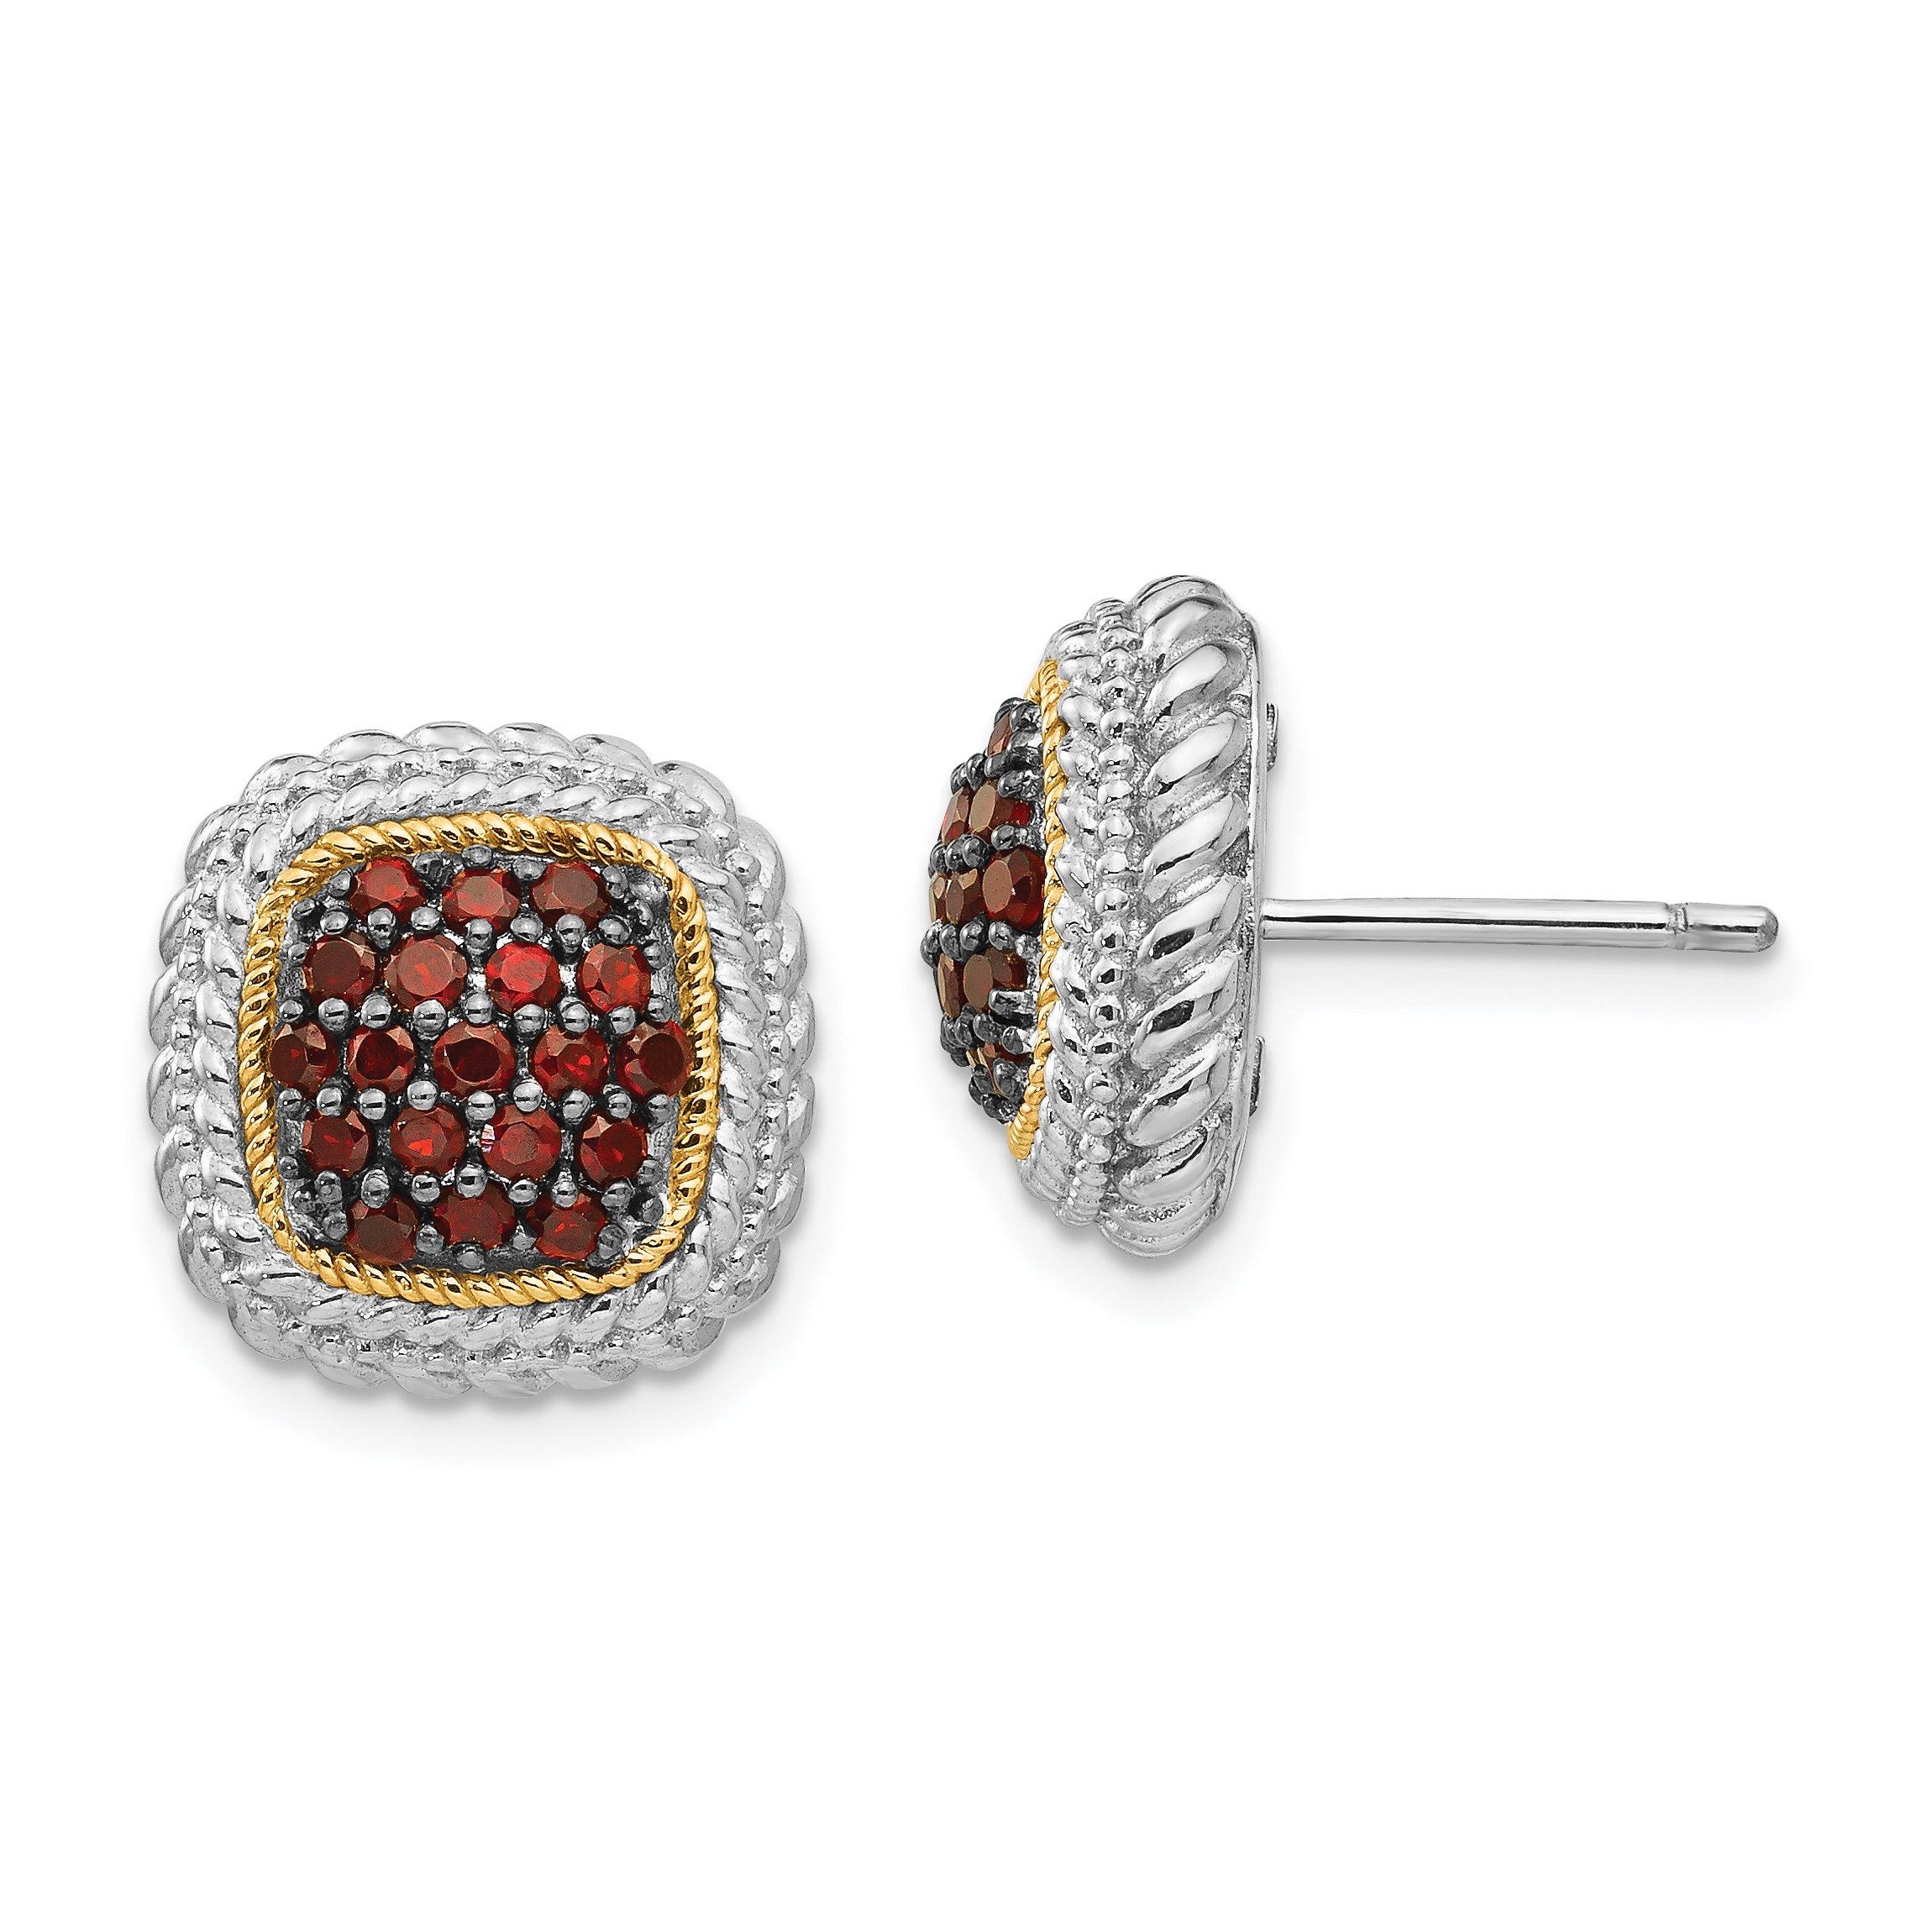 ICE CARATS 925 Sterling Silver 14k Black Red Garnet Post Stud Ball Button Earrings Fine Jewelry Gift Set For Women Heart